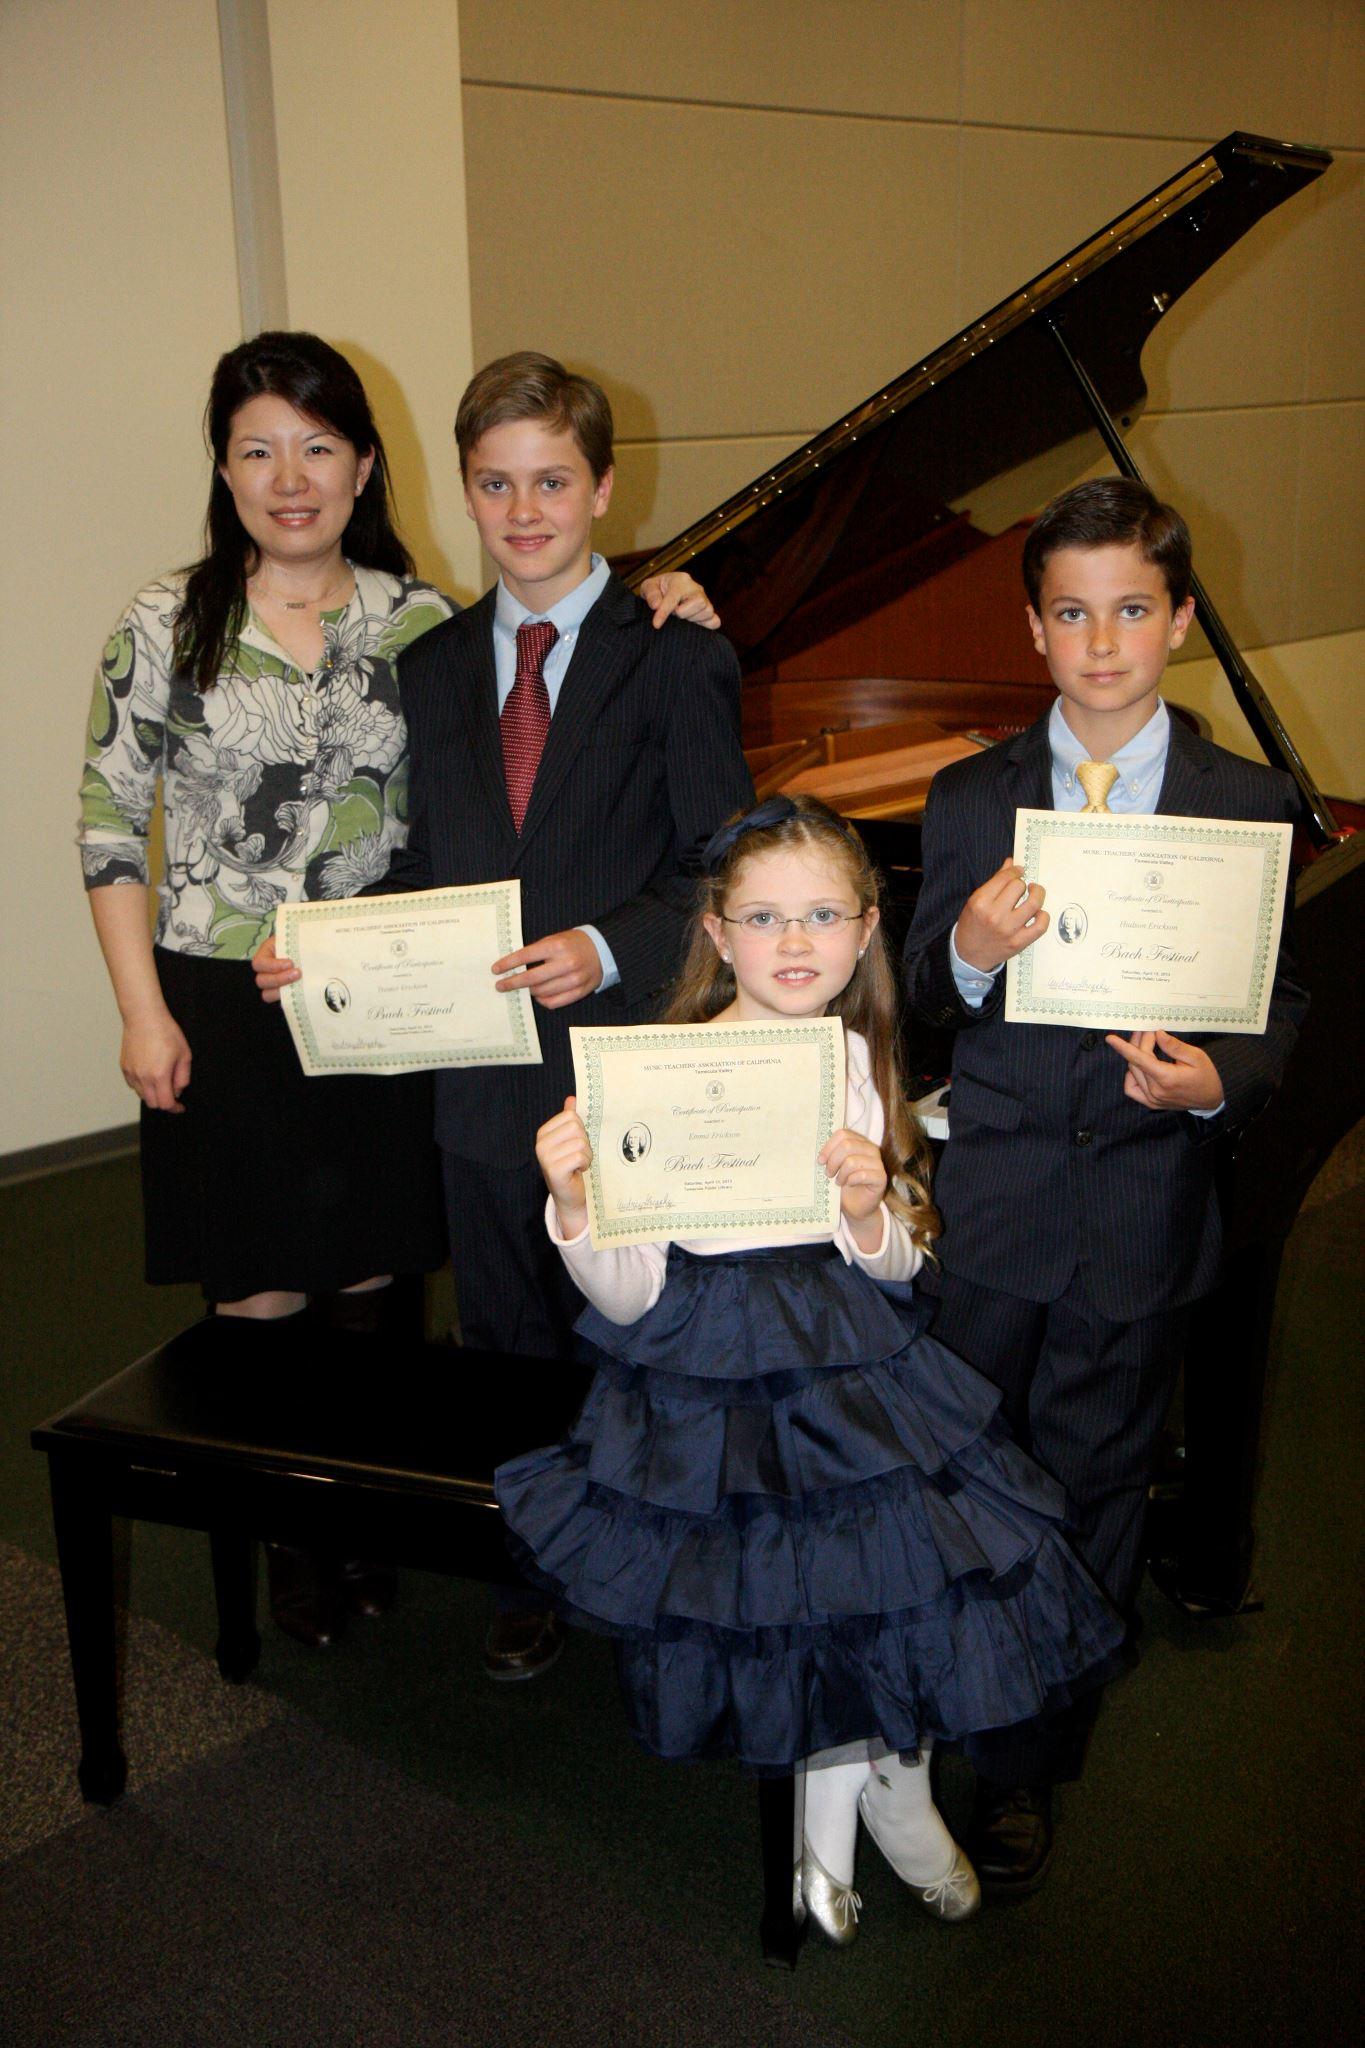 Hunter, Emma, and Hudson at Southern California Junior Bach Festival